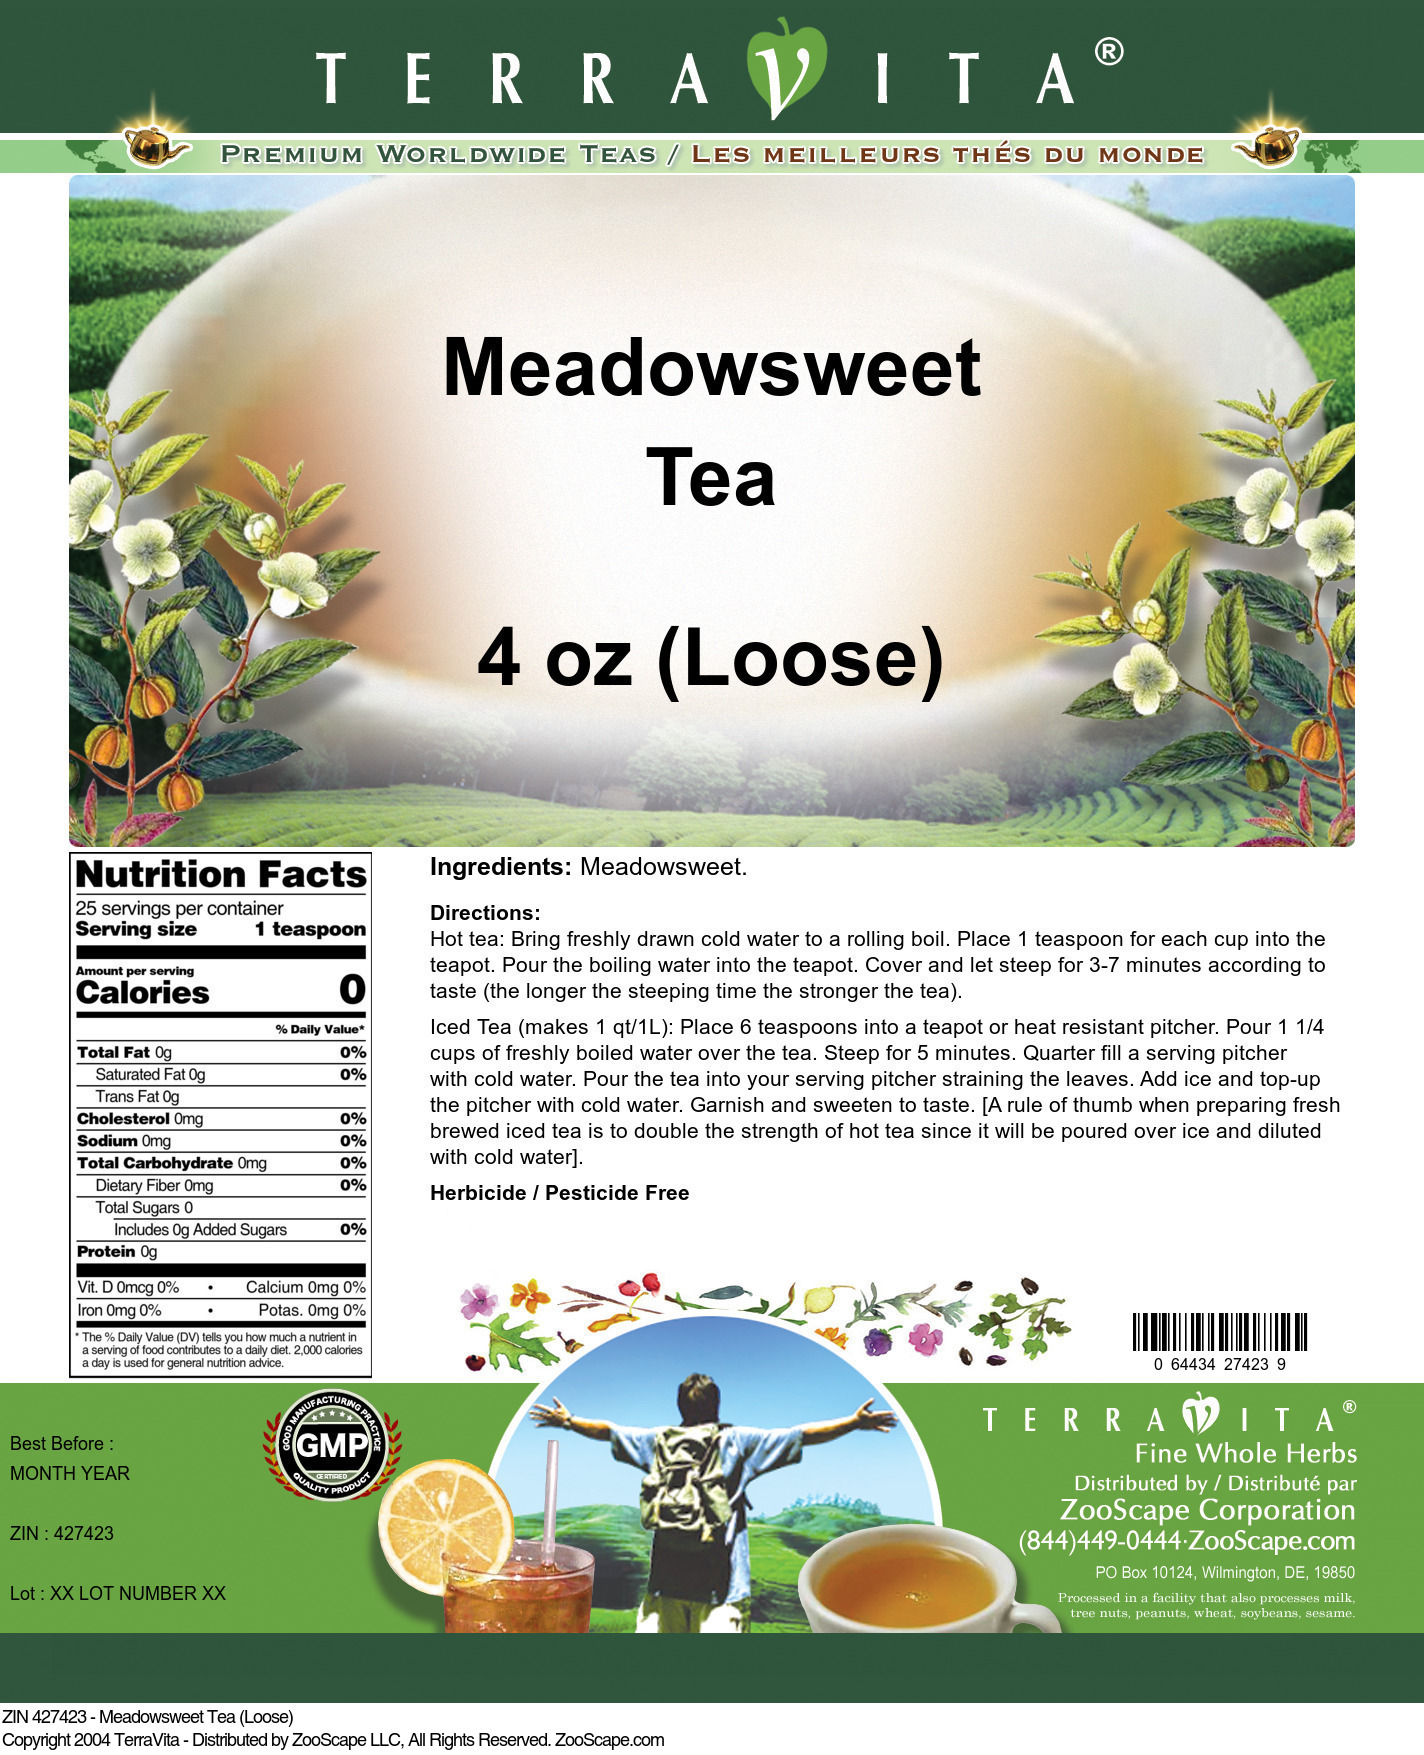 Meadowsweet Tea (Loose)